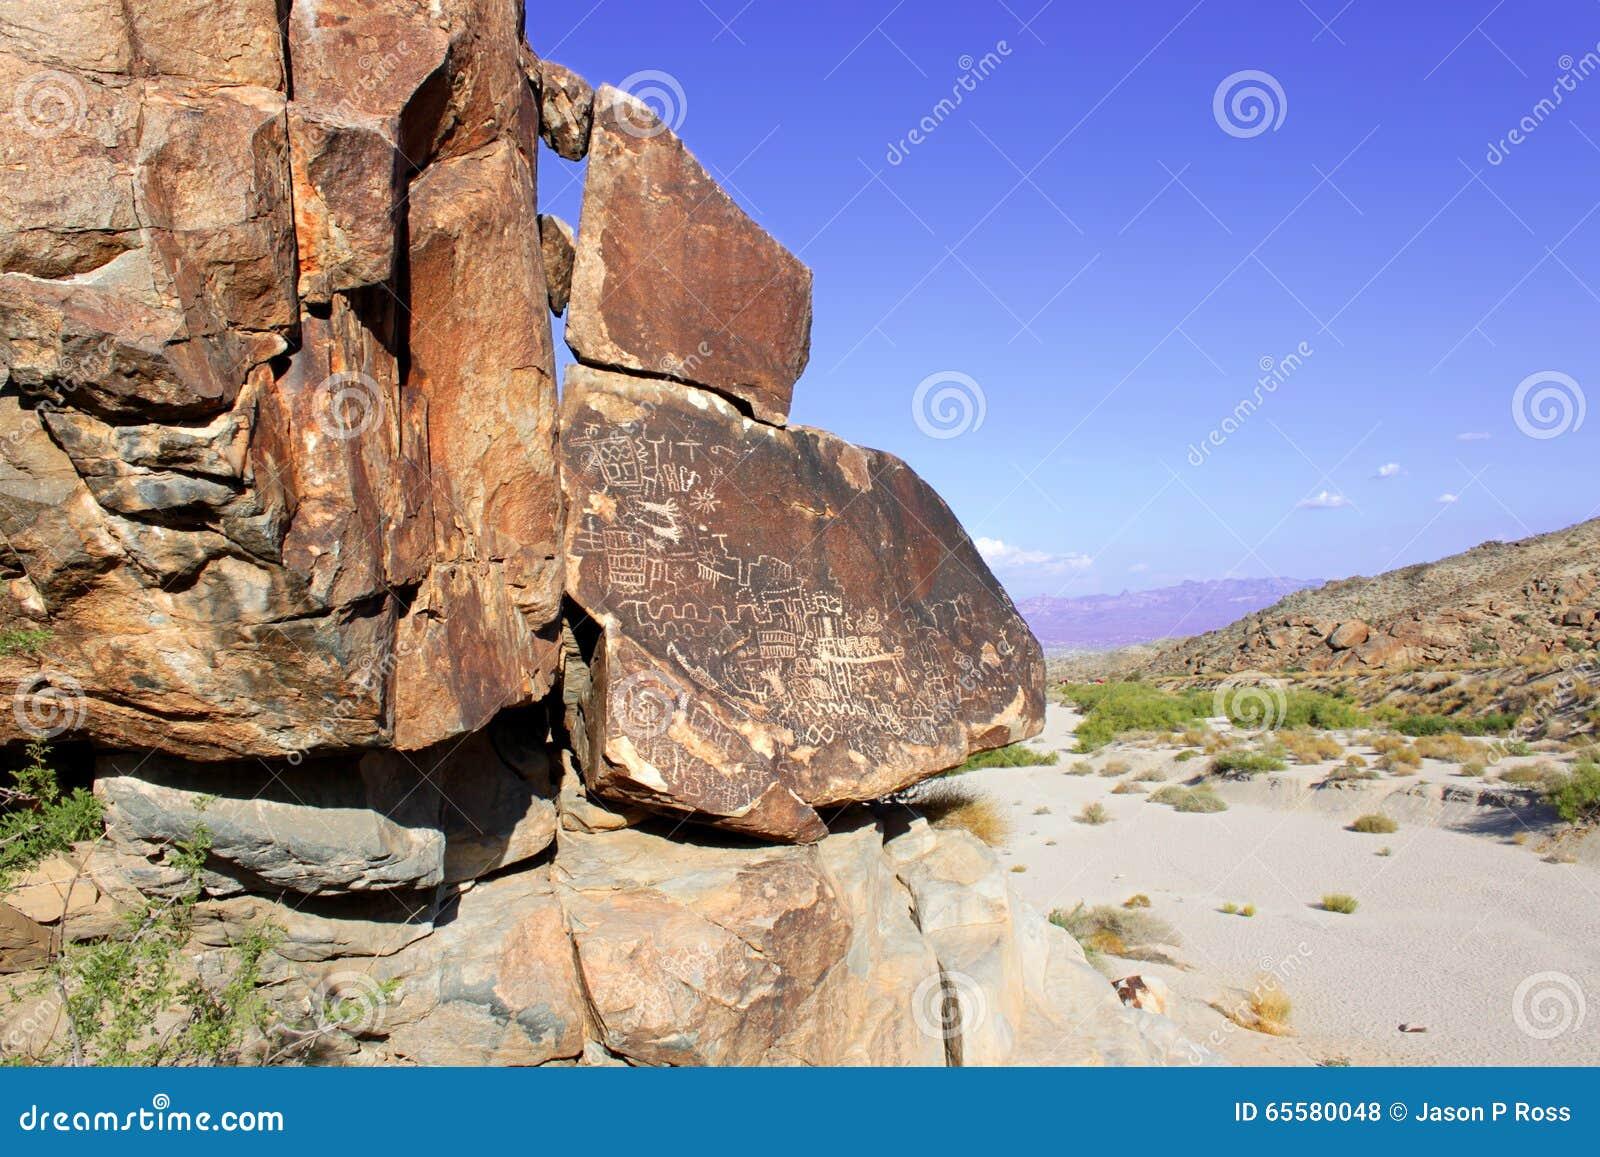 Nevada Desert Rock Petroglyphs